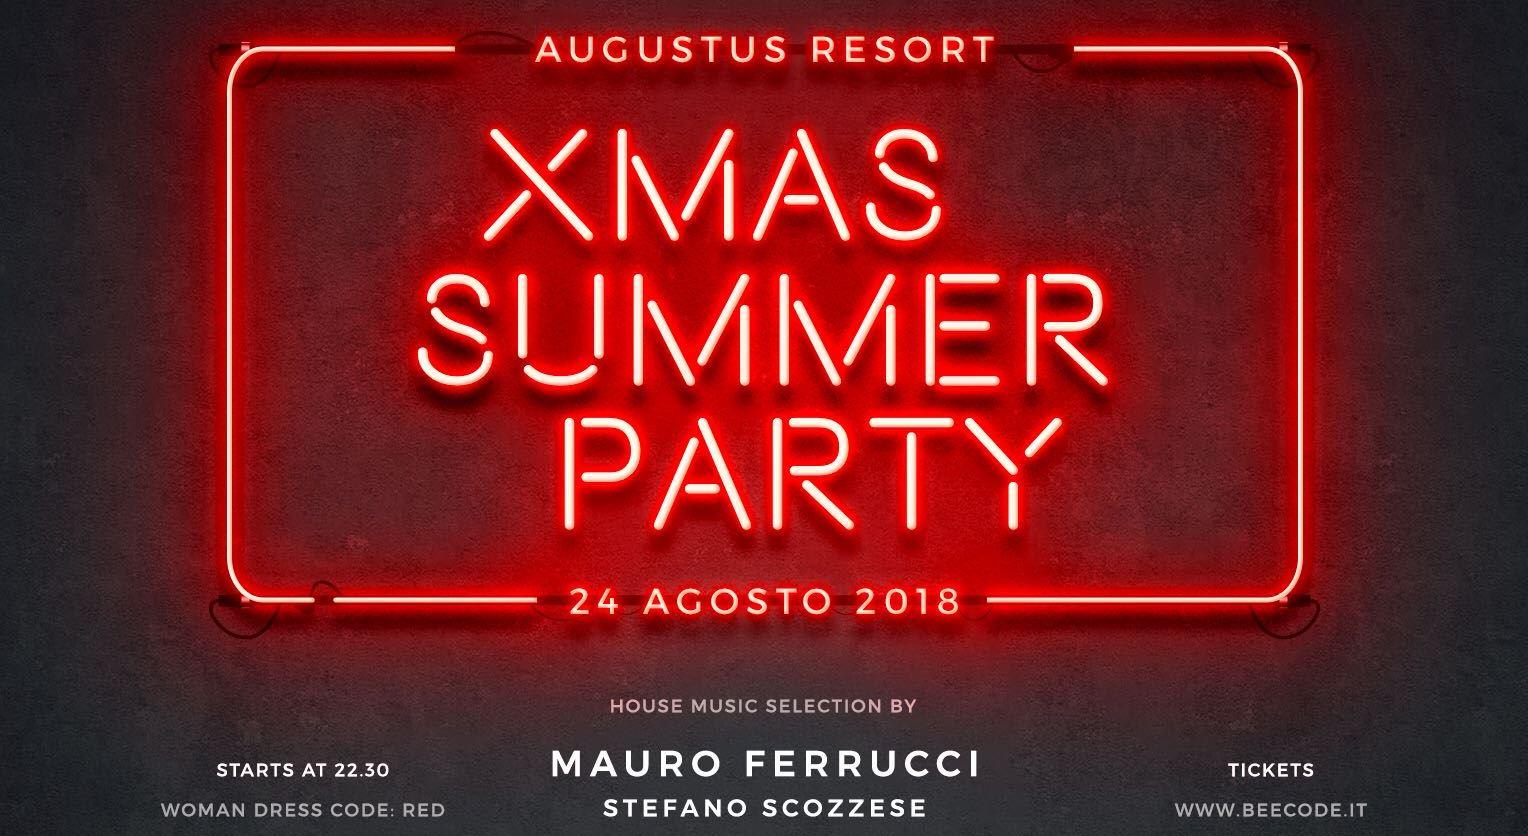 XMAS Summer Party